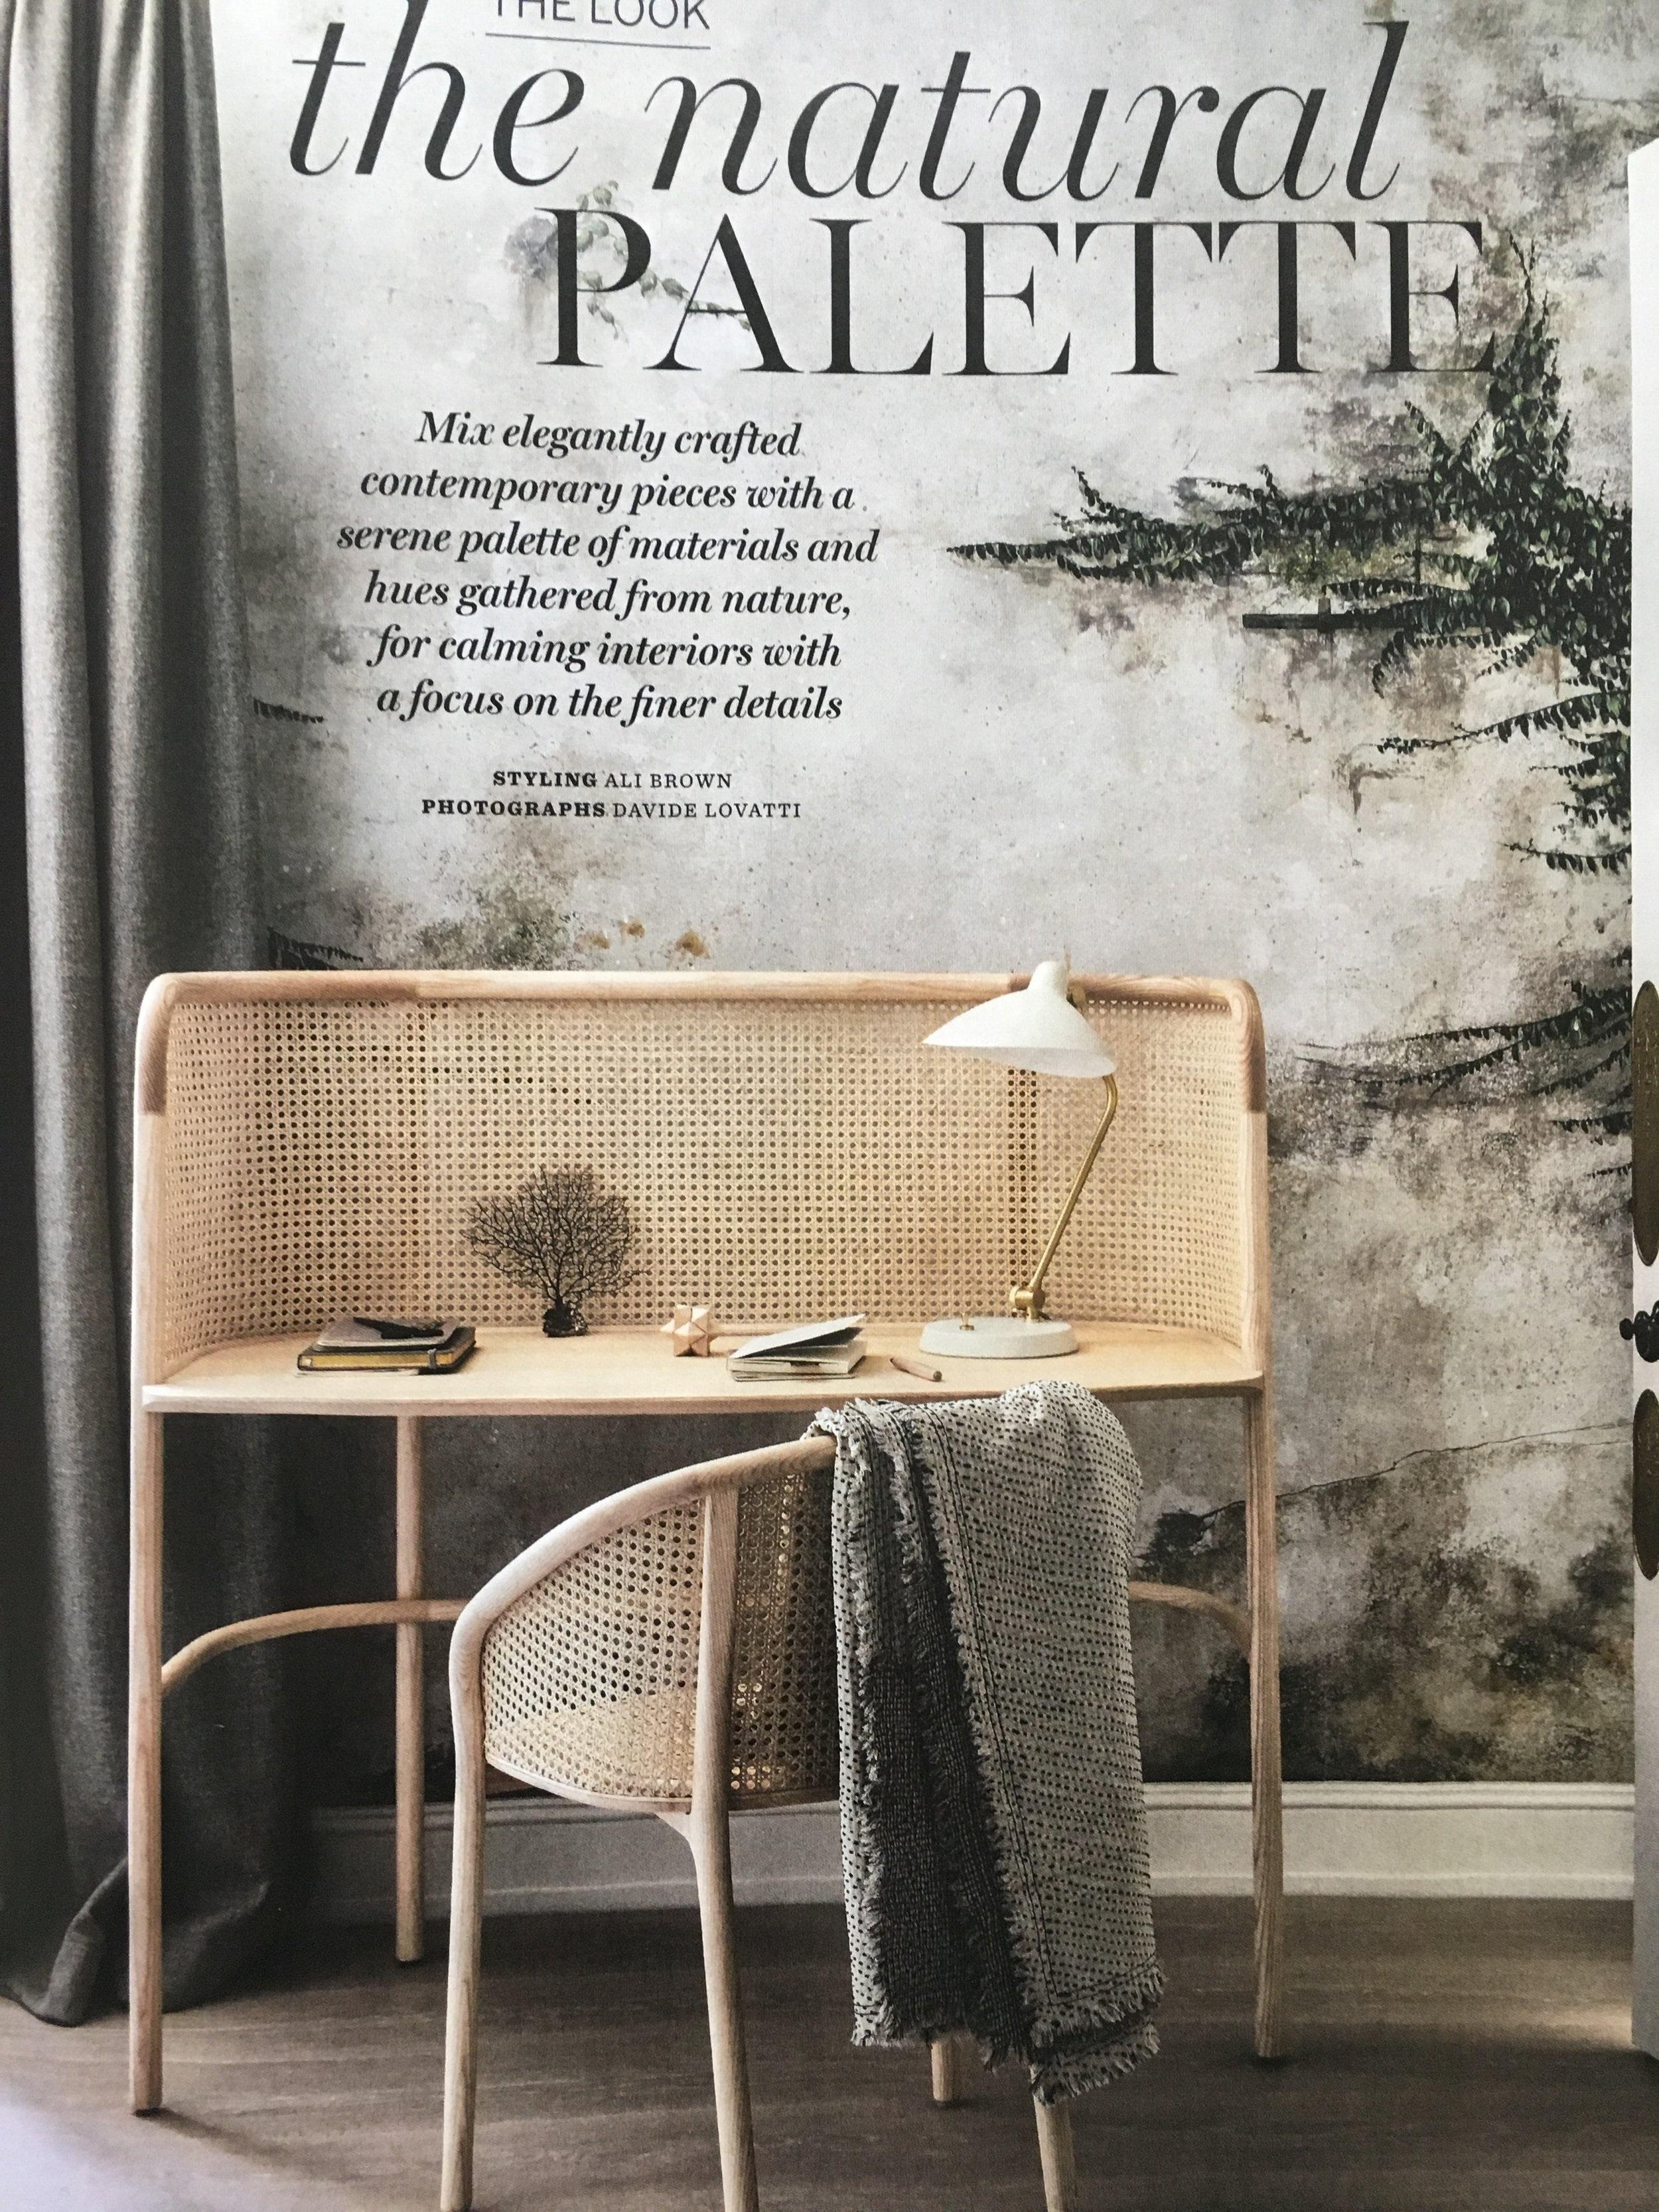 The Natural Palette for Homes & Gardens November 2018